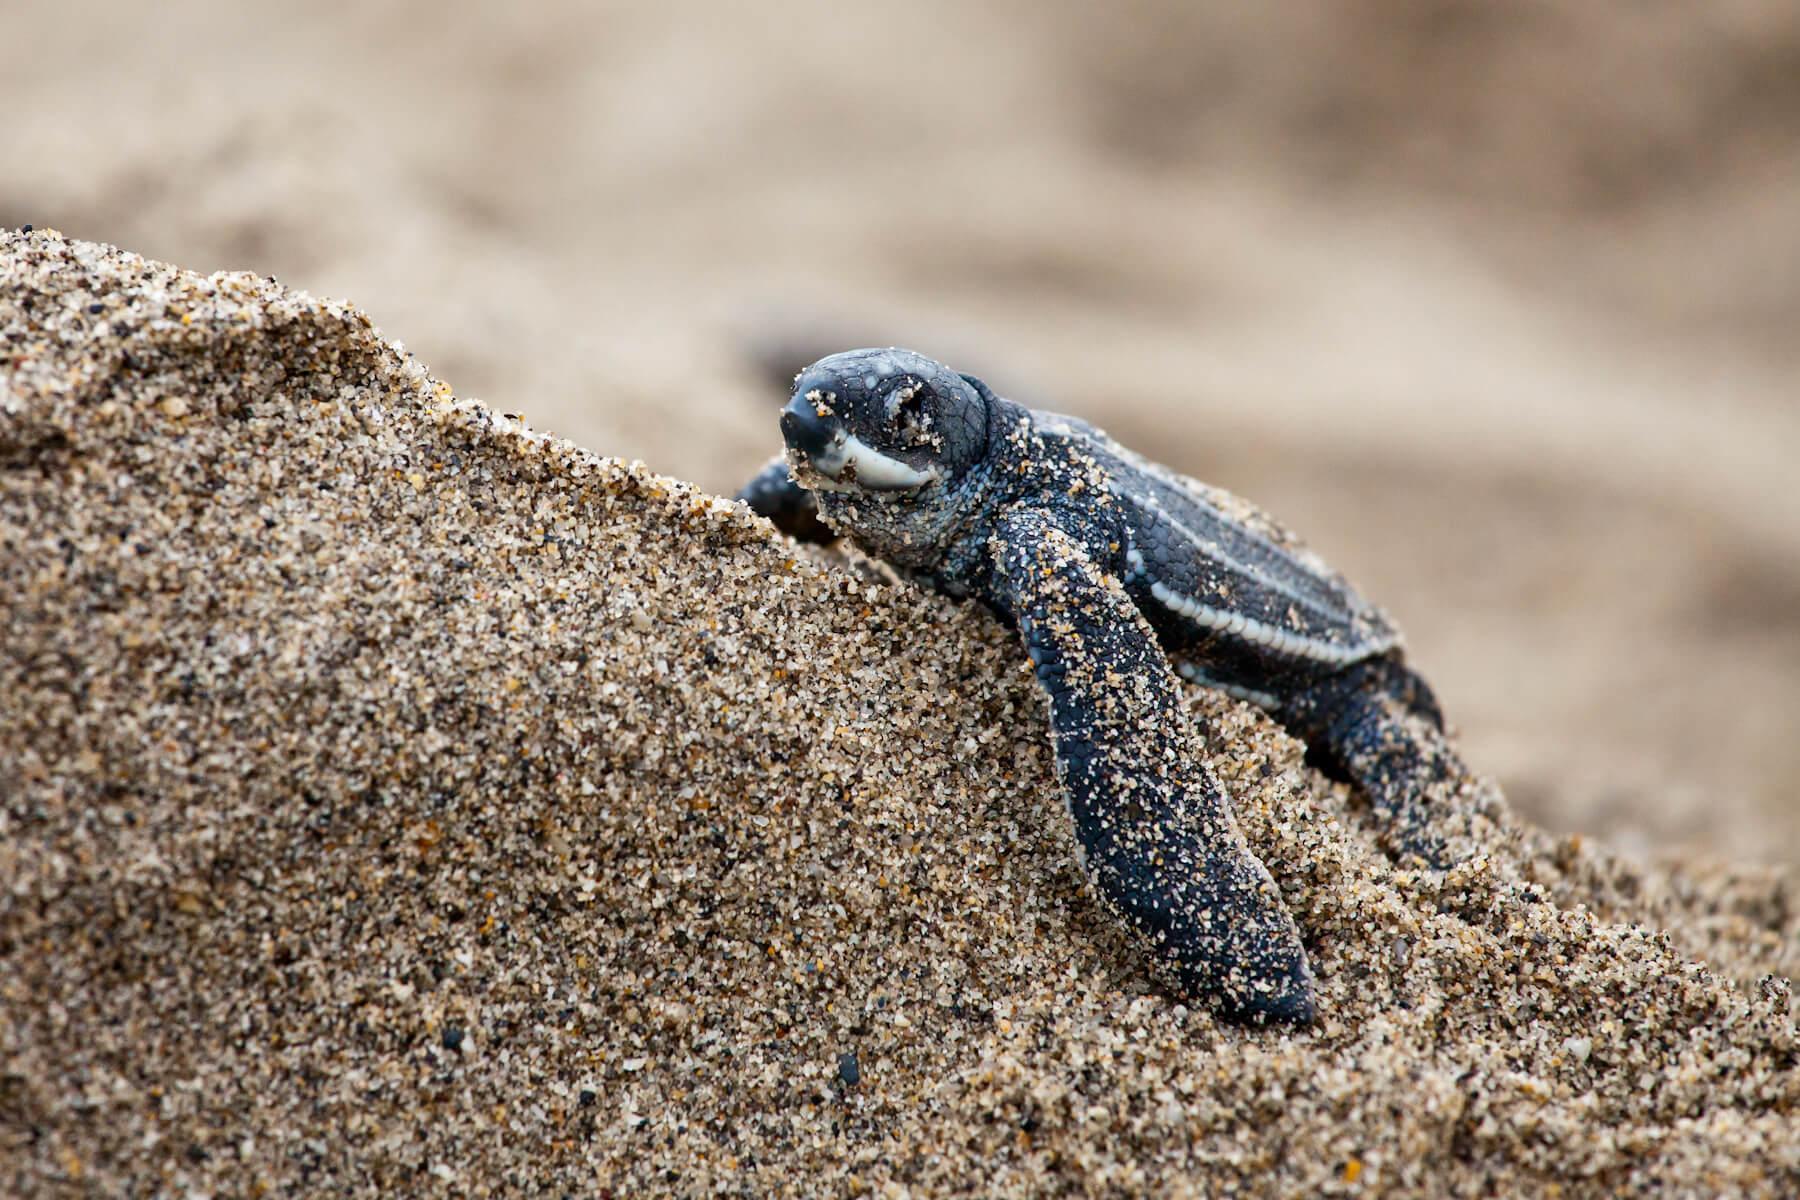 A leatherback turtle hatchling in Trinidad. © Brian J. Hutchinson